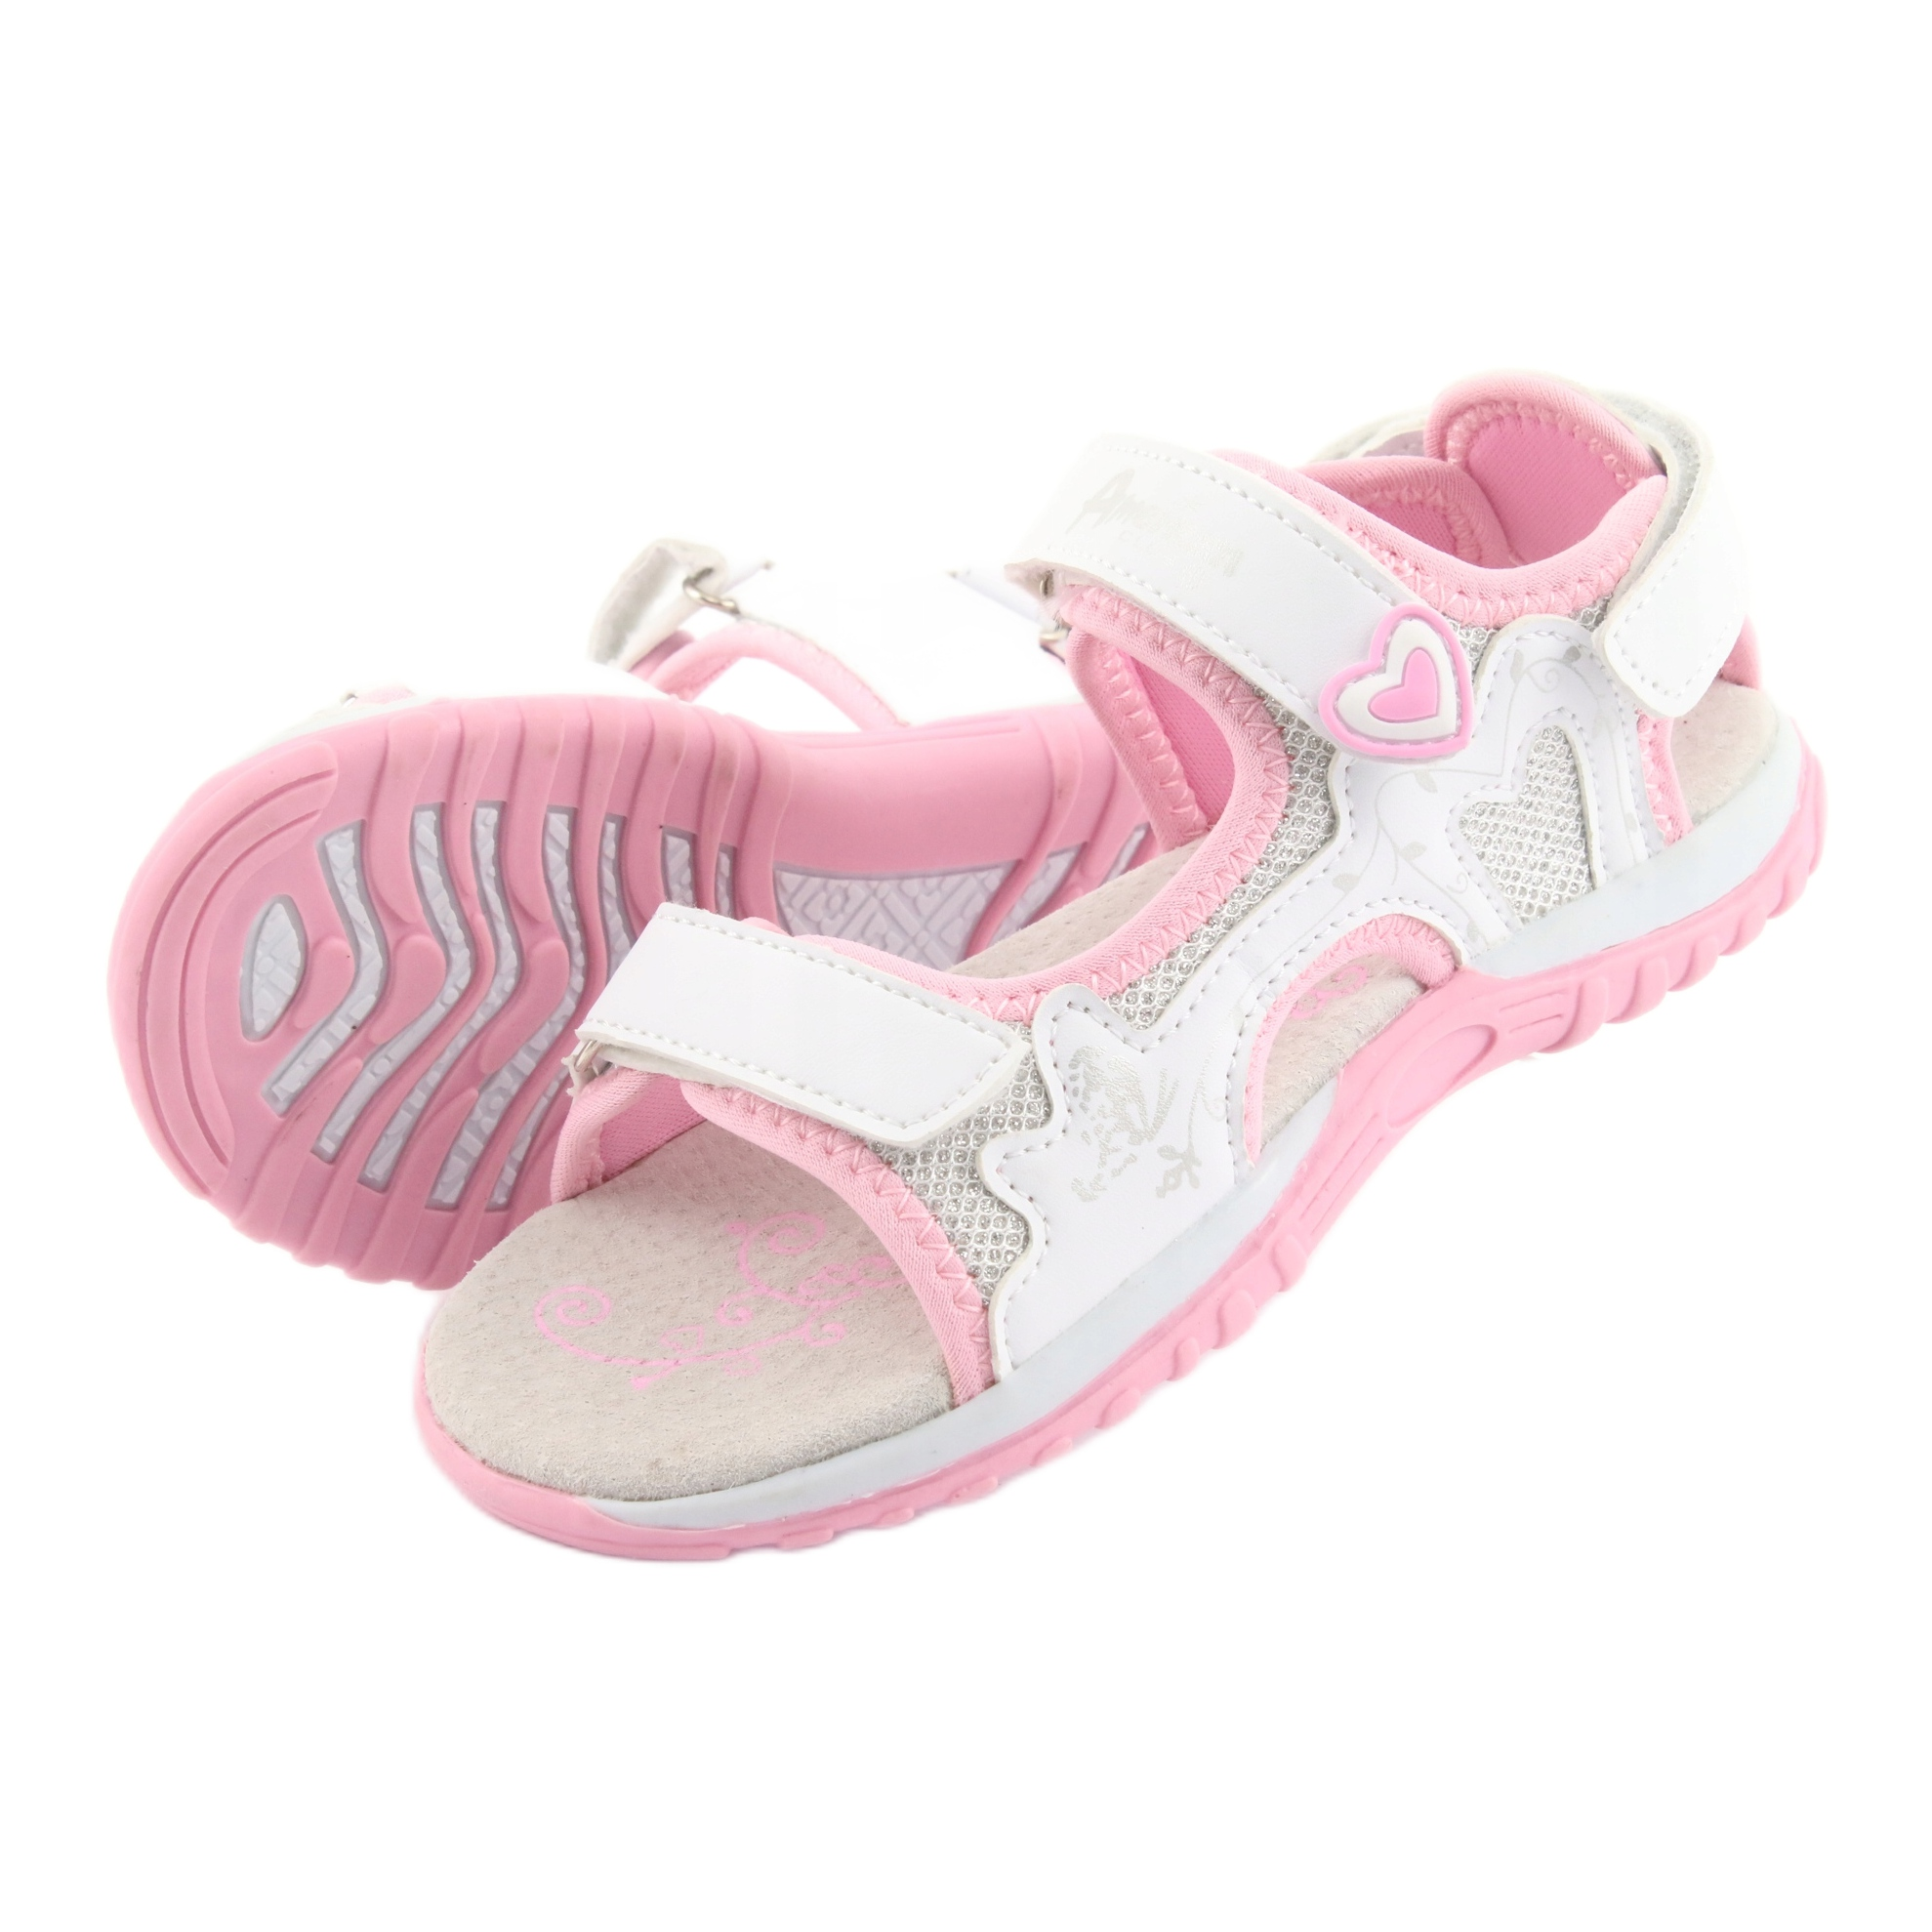 miniatura 6 - Sandali da donna di American Club bianco grigio rosa